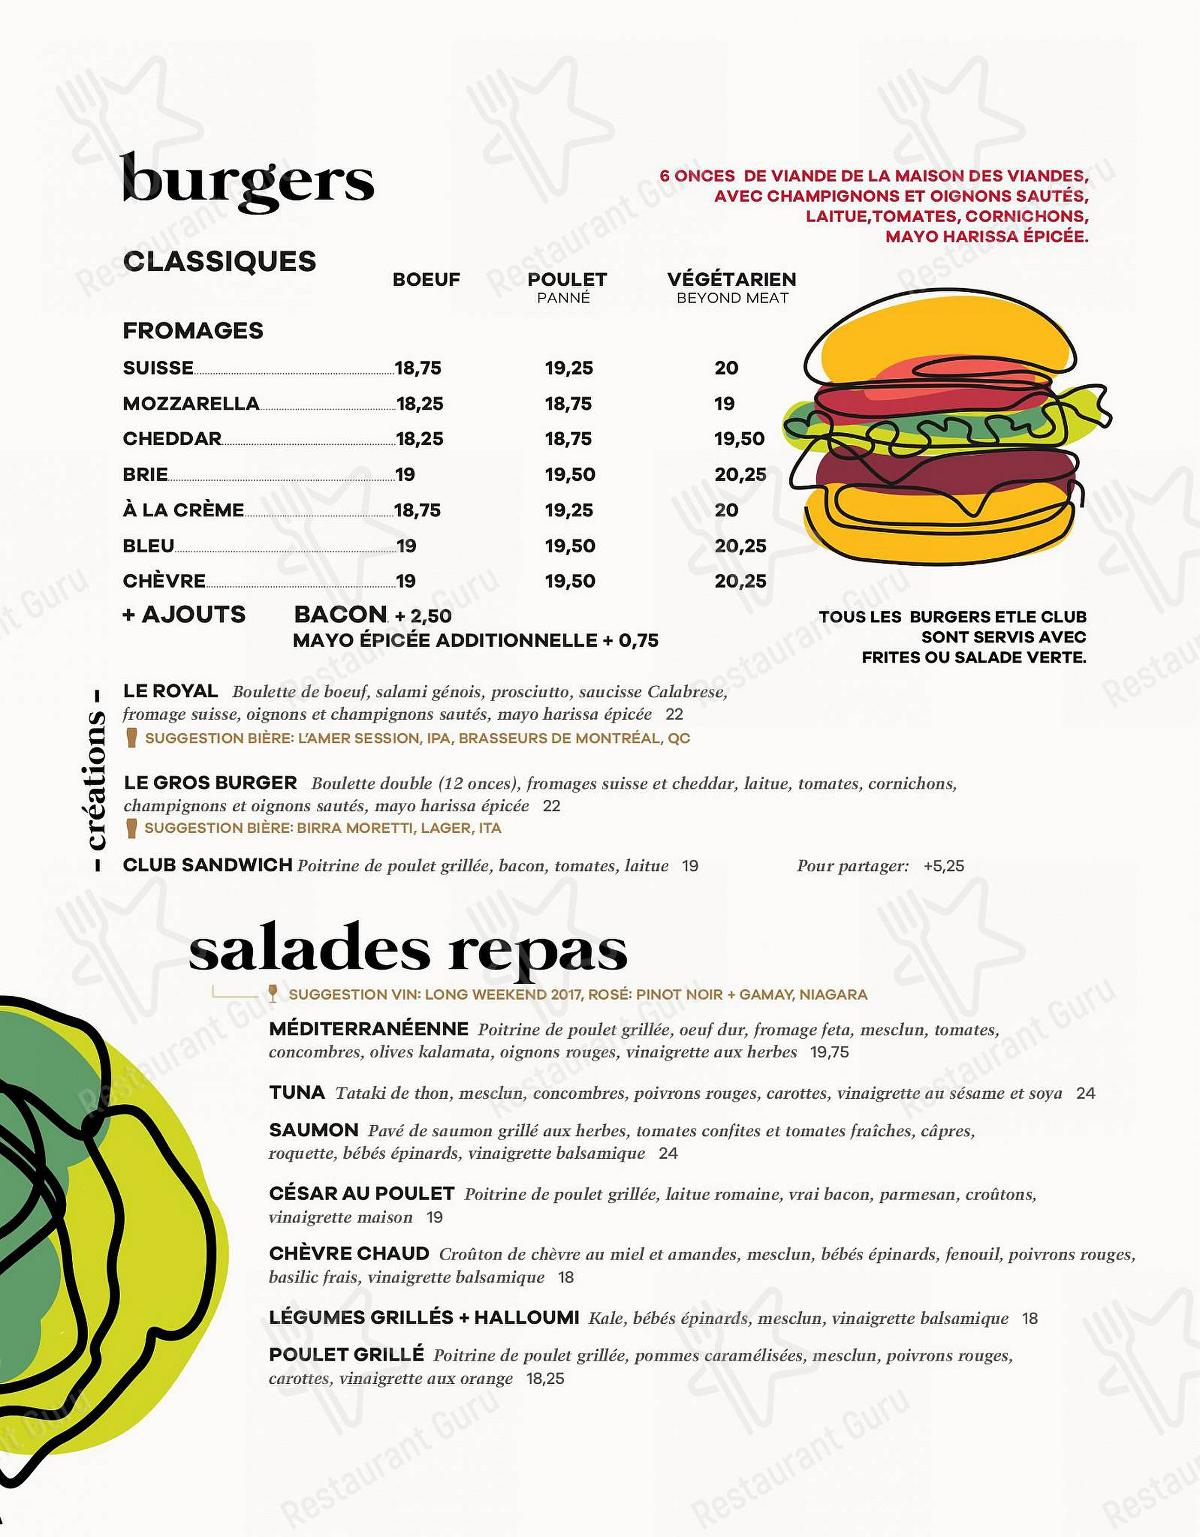 Pizzé menu - dishes and beverages